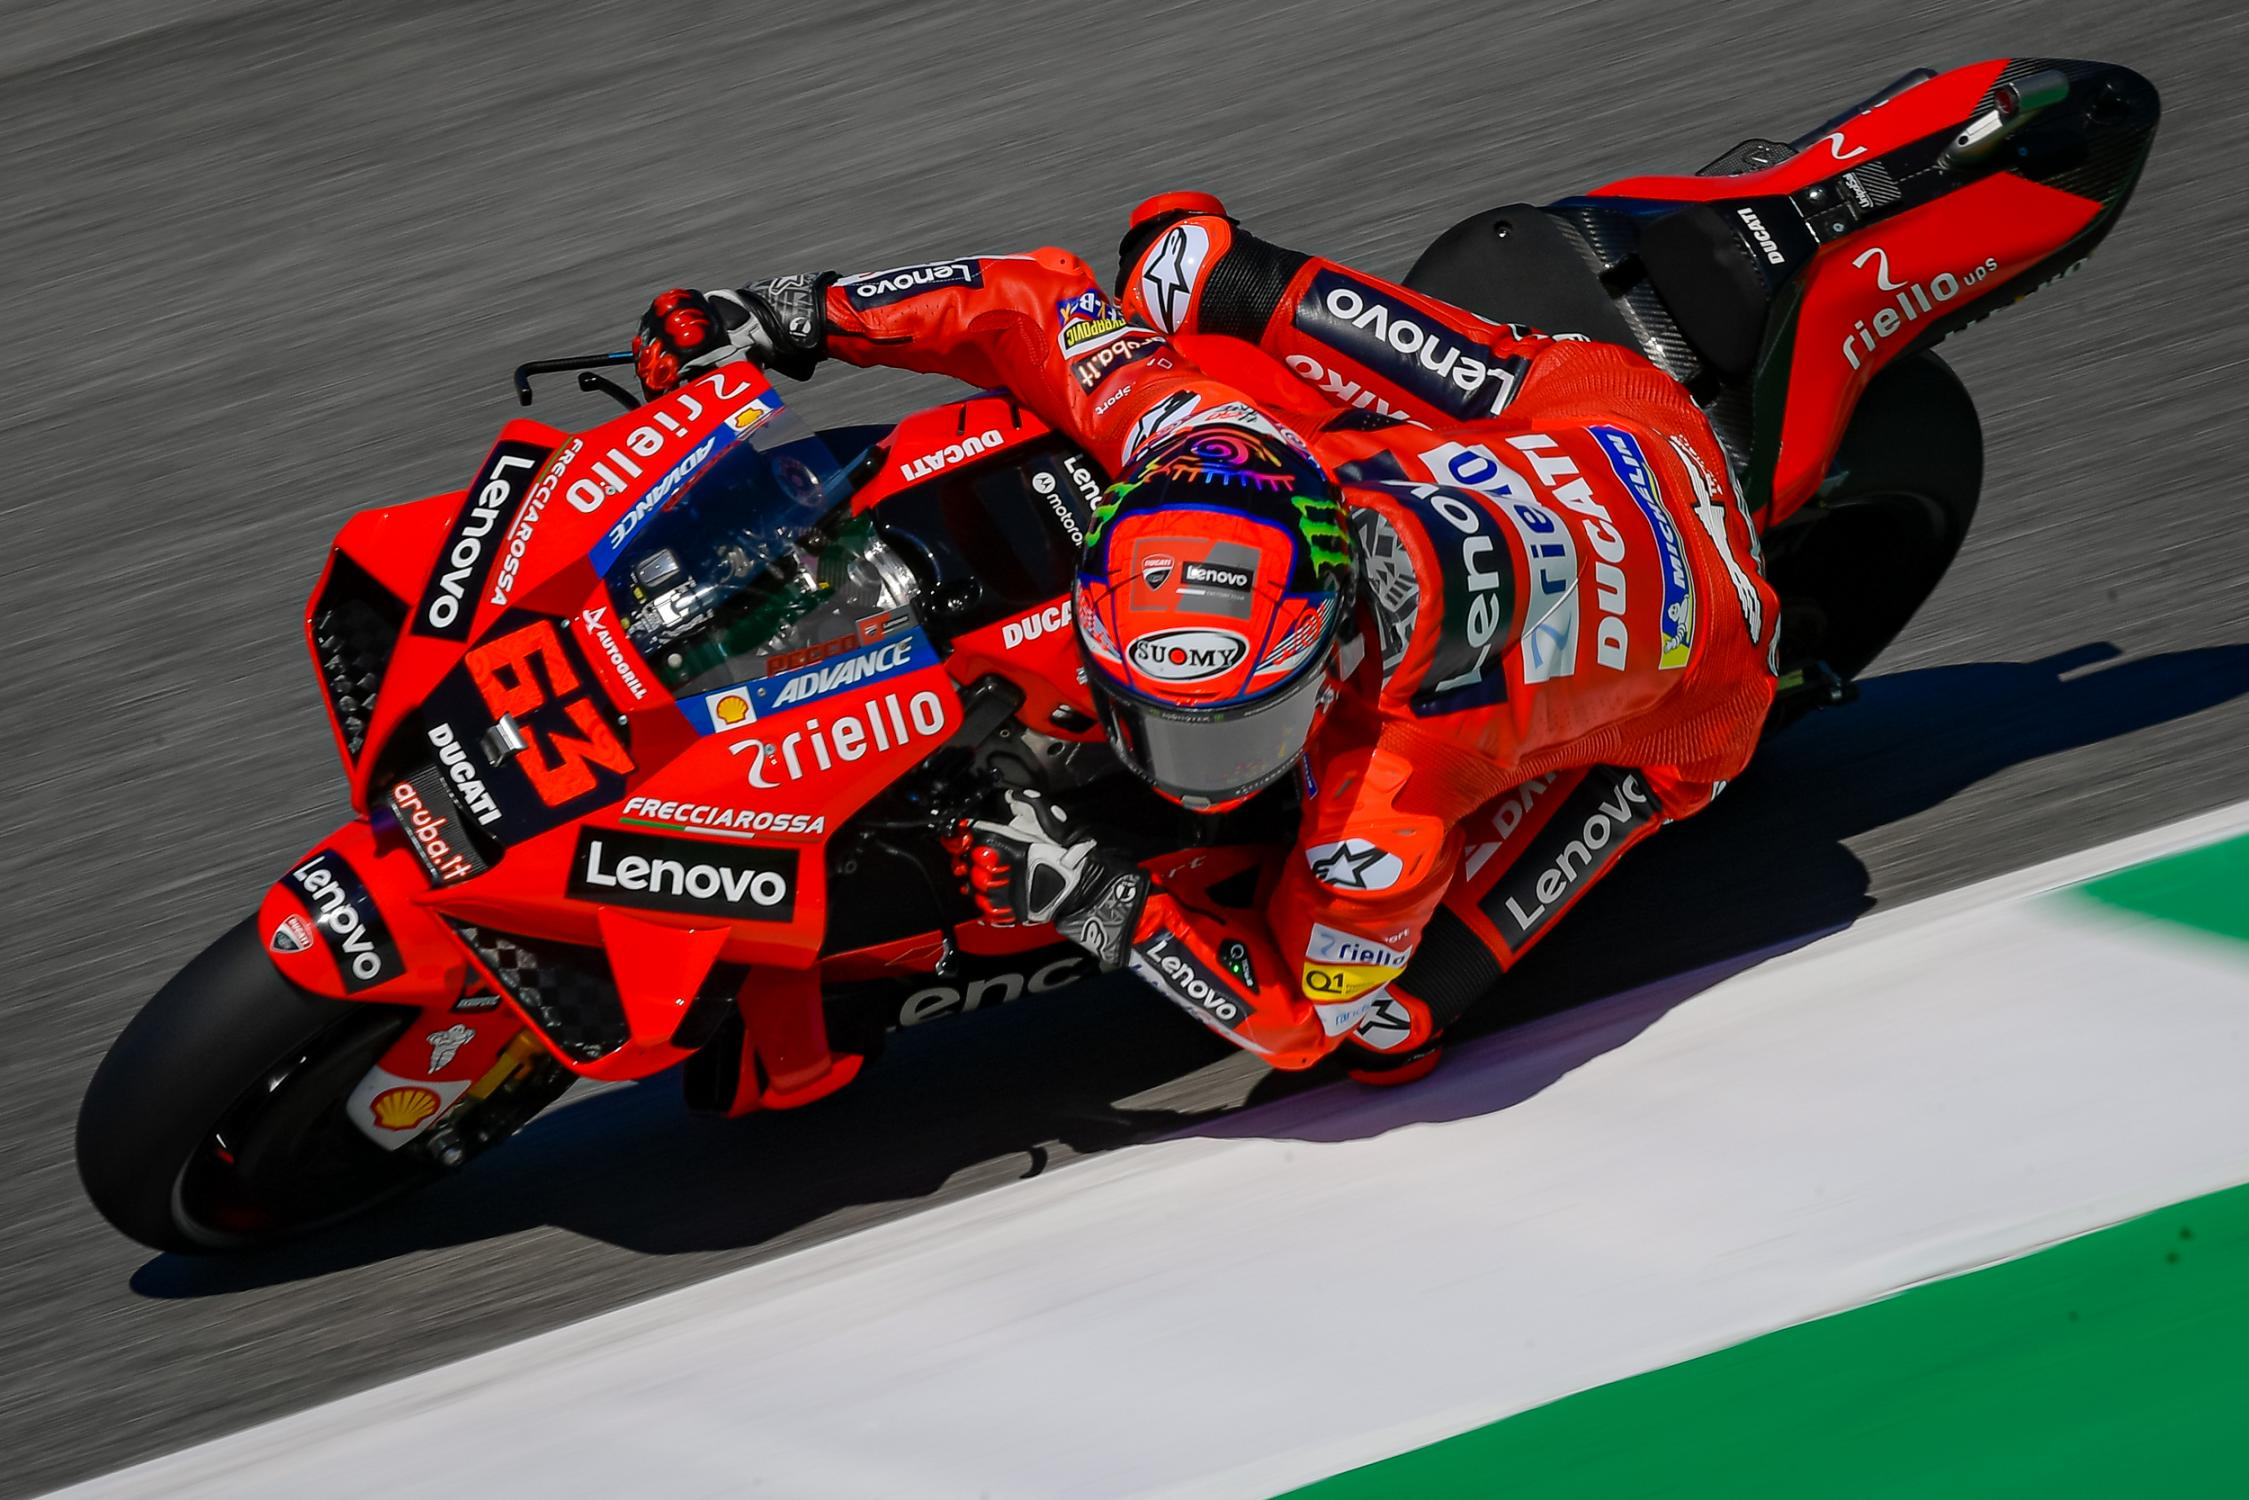 MOTO GRAND PRIX D' ITALIE Francesco-bagnaia-mugello-motogp-2021